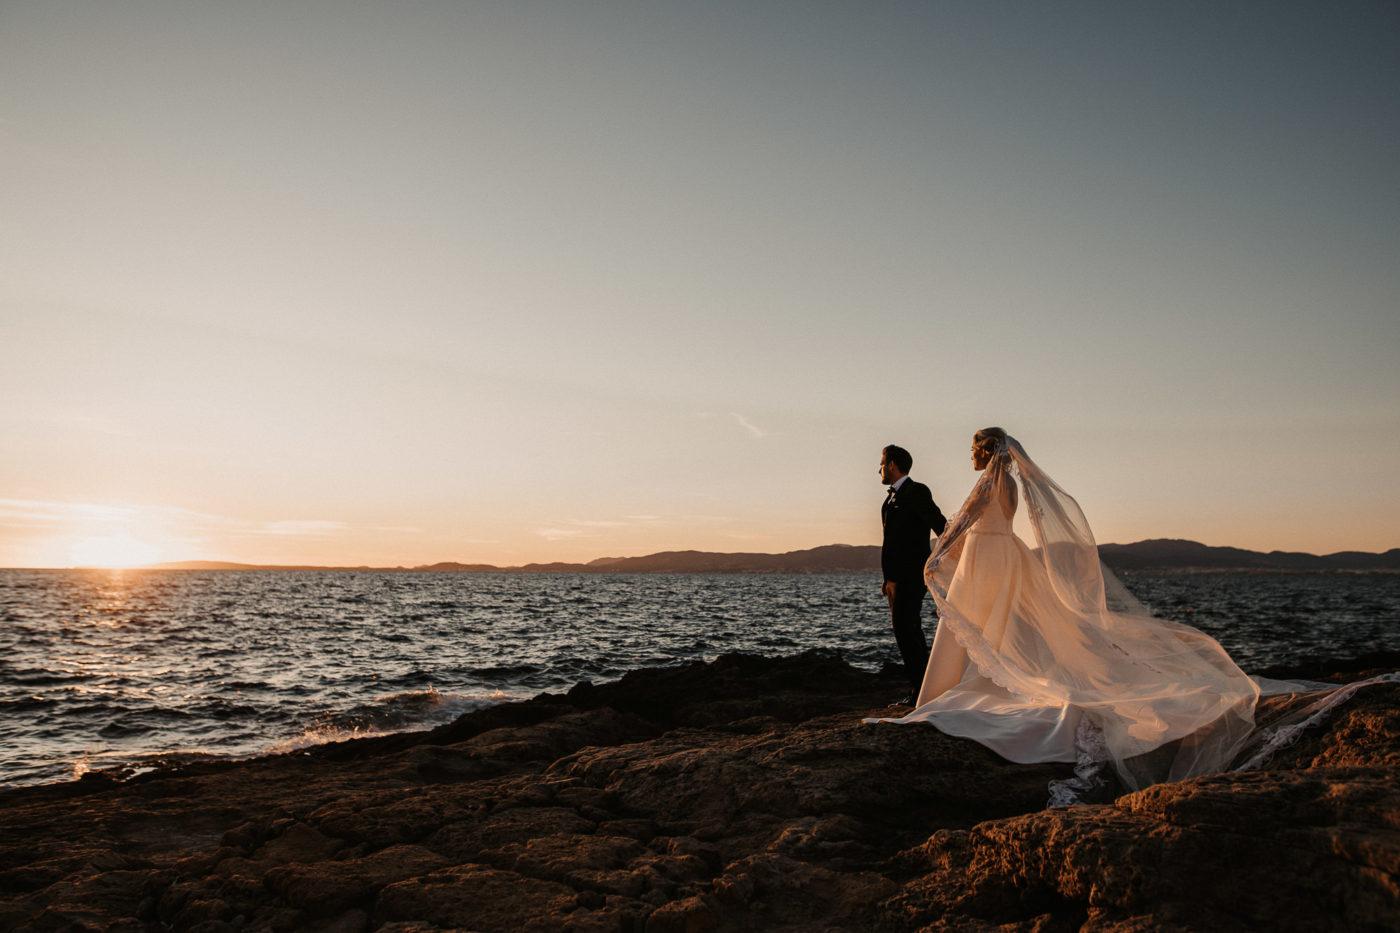 Das Hochzeitspaar zum Sonnenuntergang am Felsenstrand im Cap Rocat